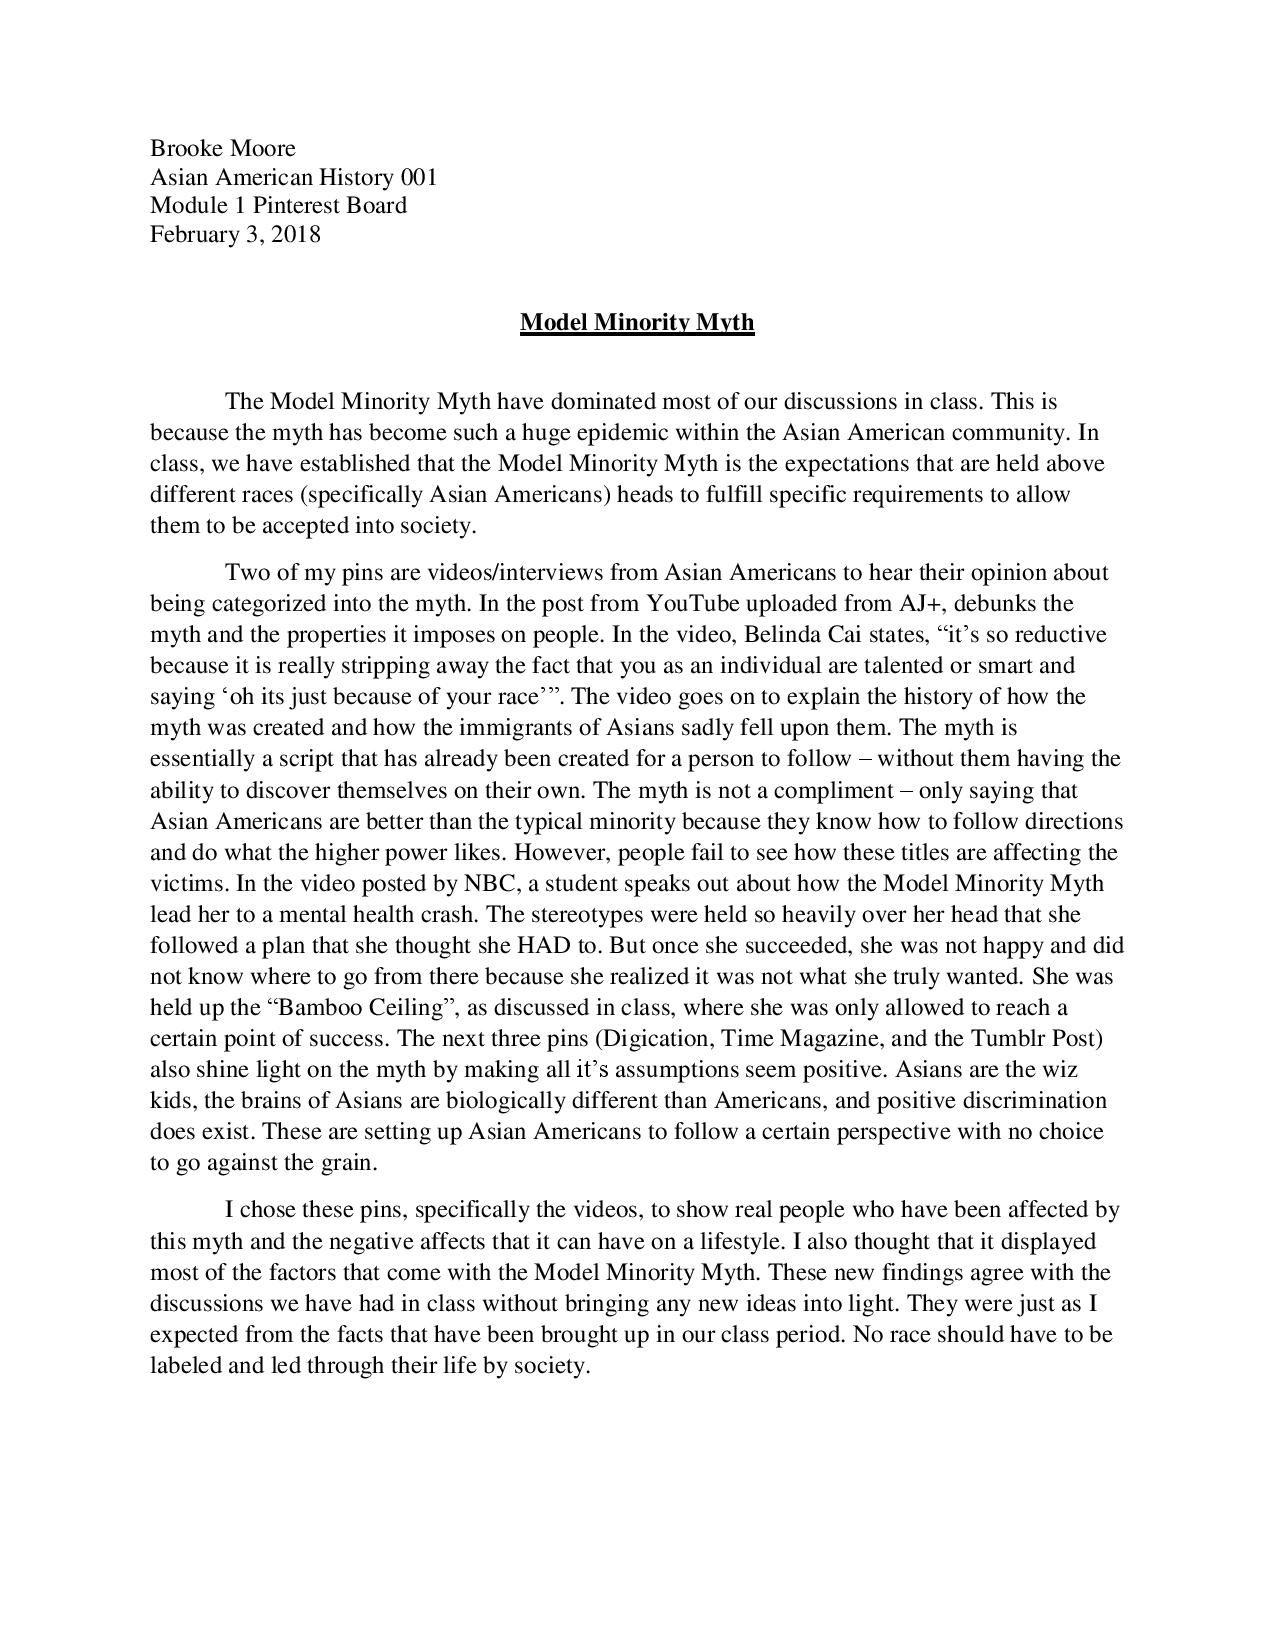 Asians model minority essay how to write degree essays